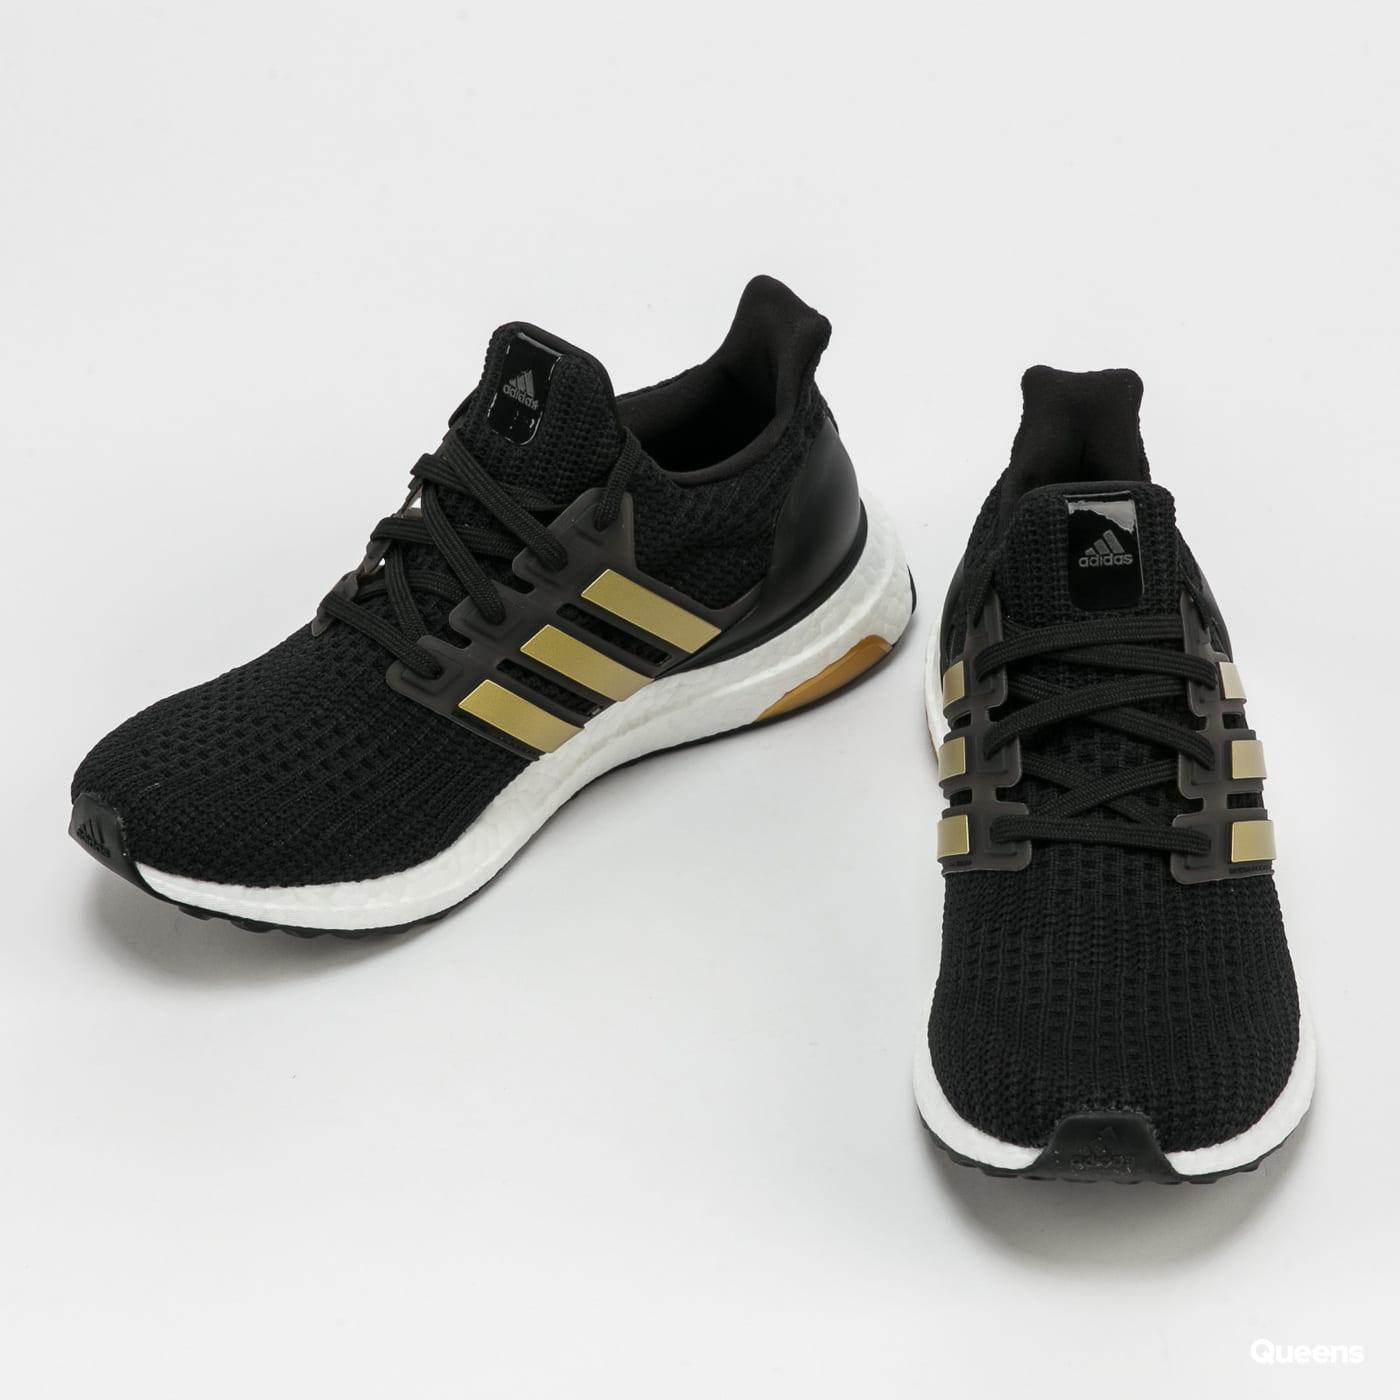 adidas Performance Ultraboost 4.0 DNA W cblack / gold metallic / cwhite